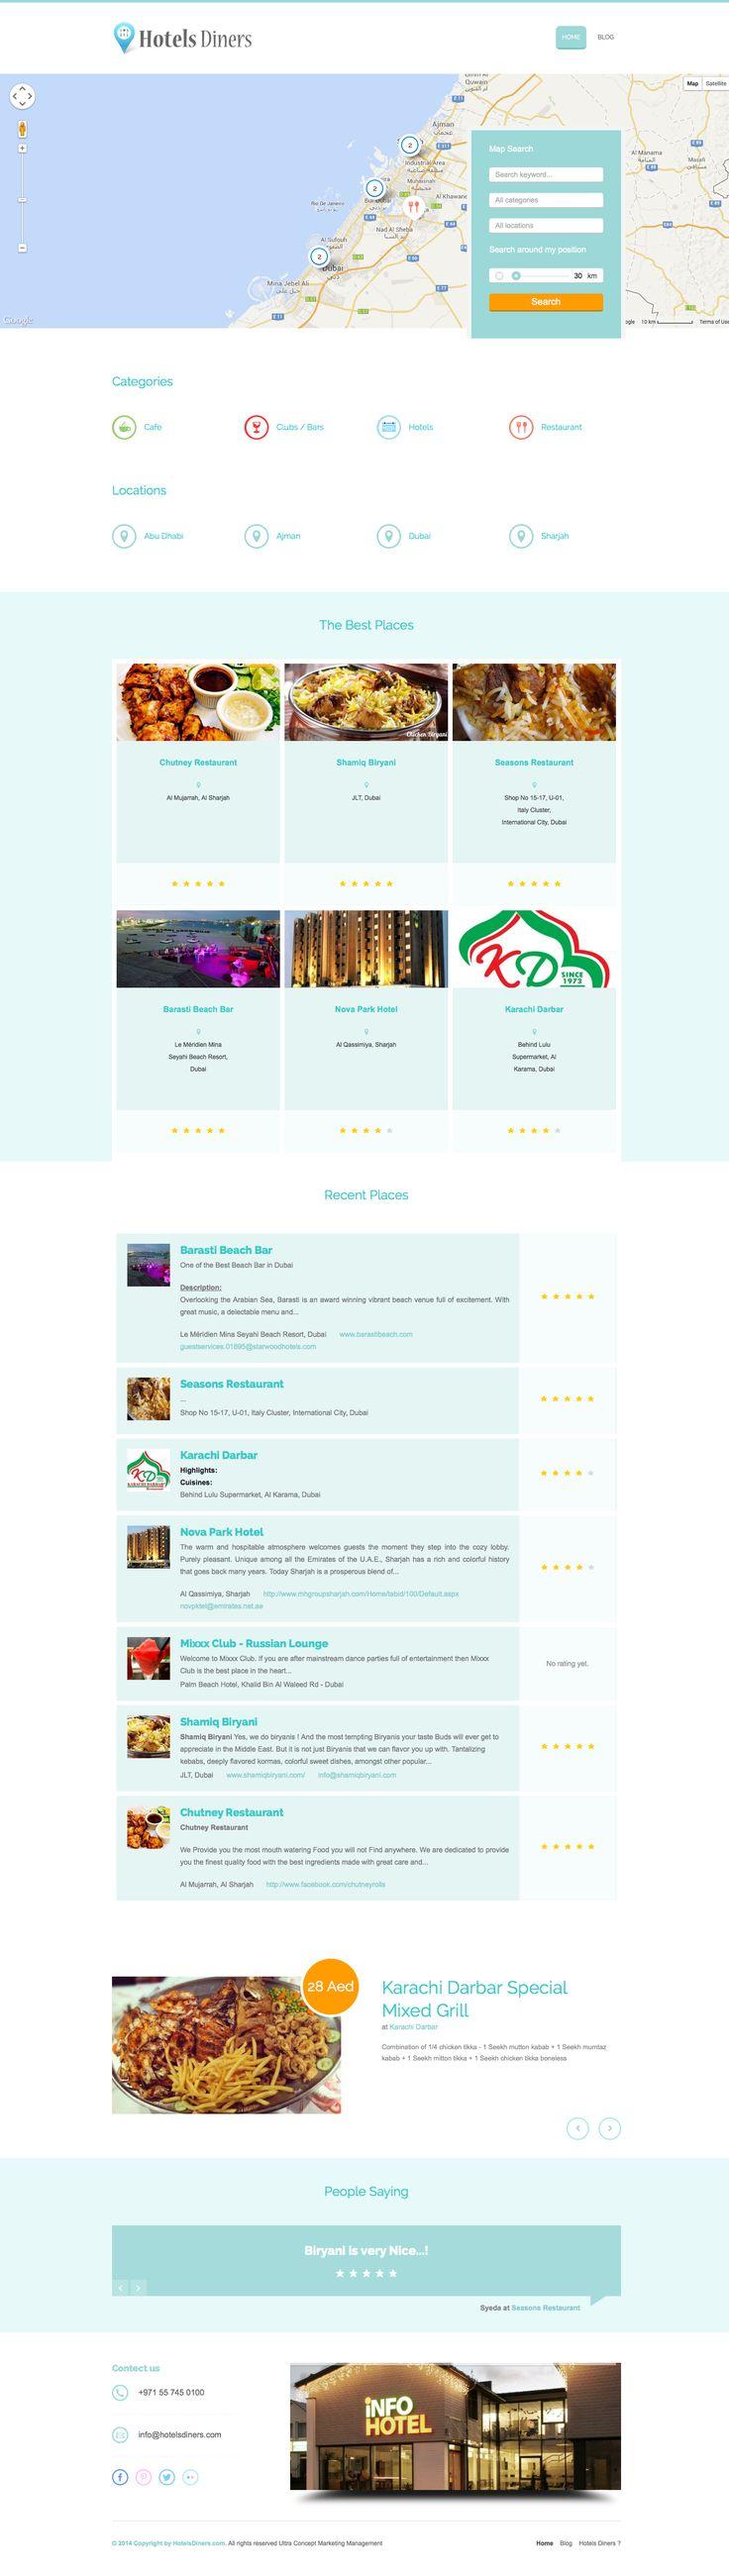 AIT Showcase - Business Finder: Find Hotels or Restaurants in Dubai, Sharjah, Abu Dhabi or Ajman at http://www.hotelsdiners.com